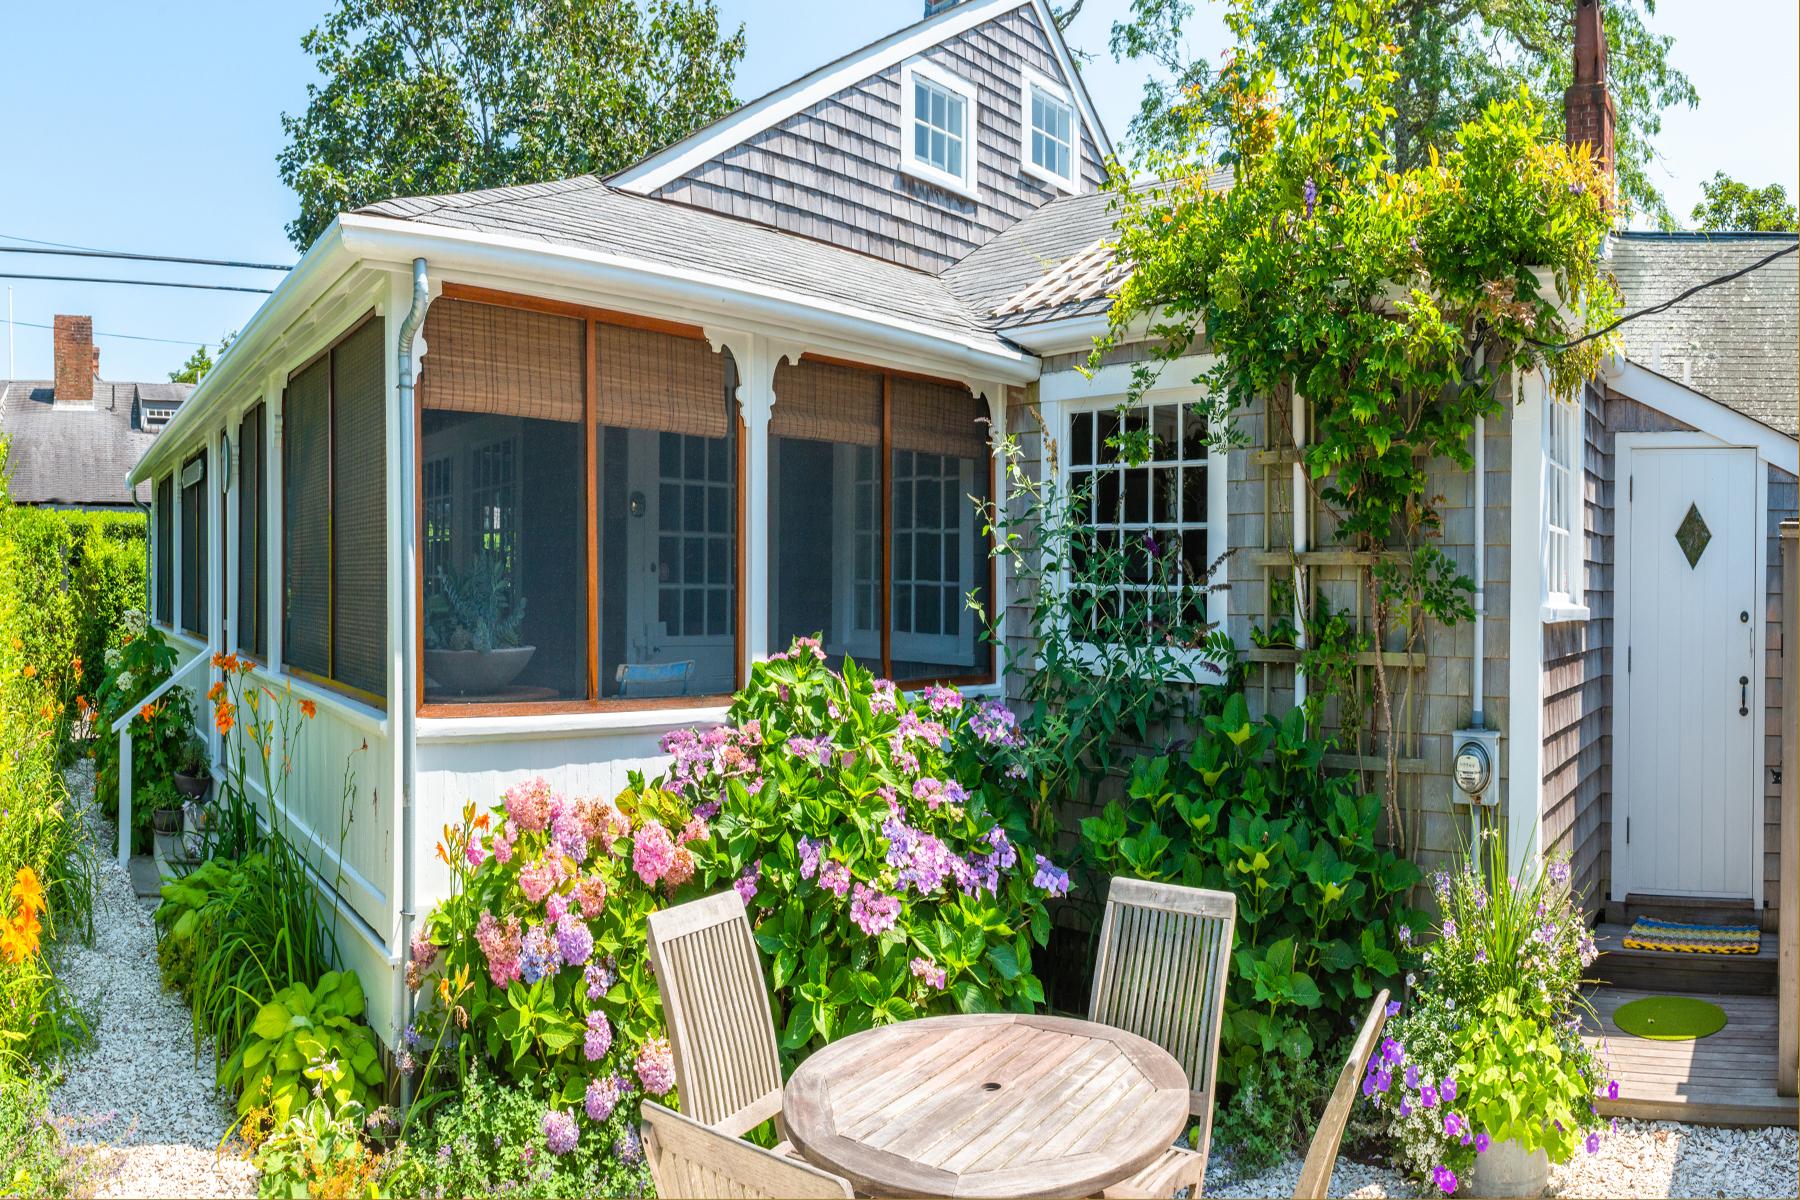 Single Family Homes για την Πώληση στο A Sophisticated Cottage in the Heart of Sconset 2 King Street, Siasconset, Μασαχουσετη 02564 Ηνωμένες Πολιτείες